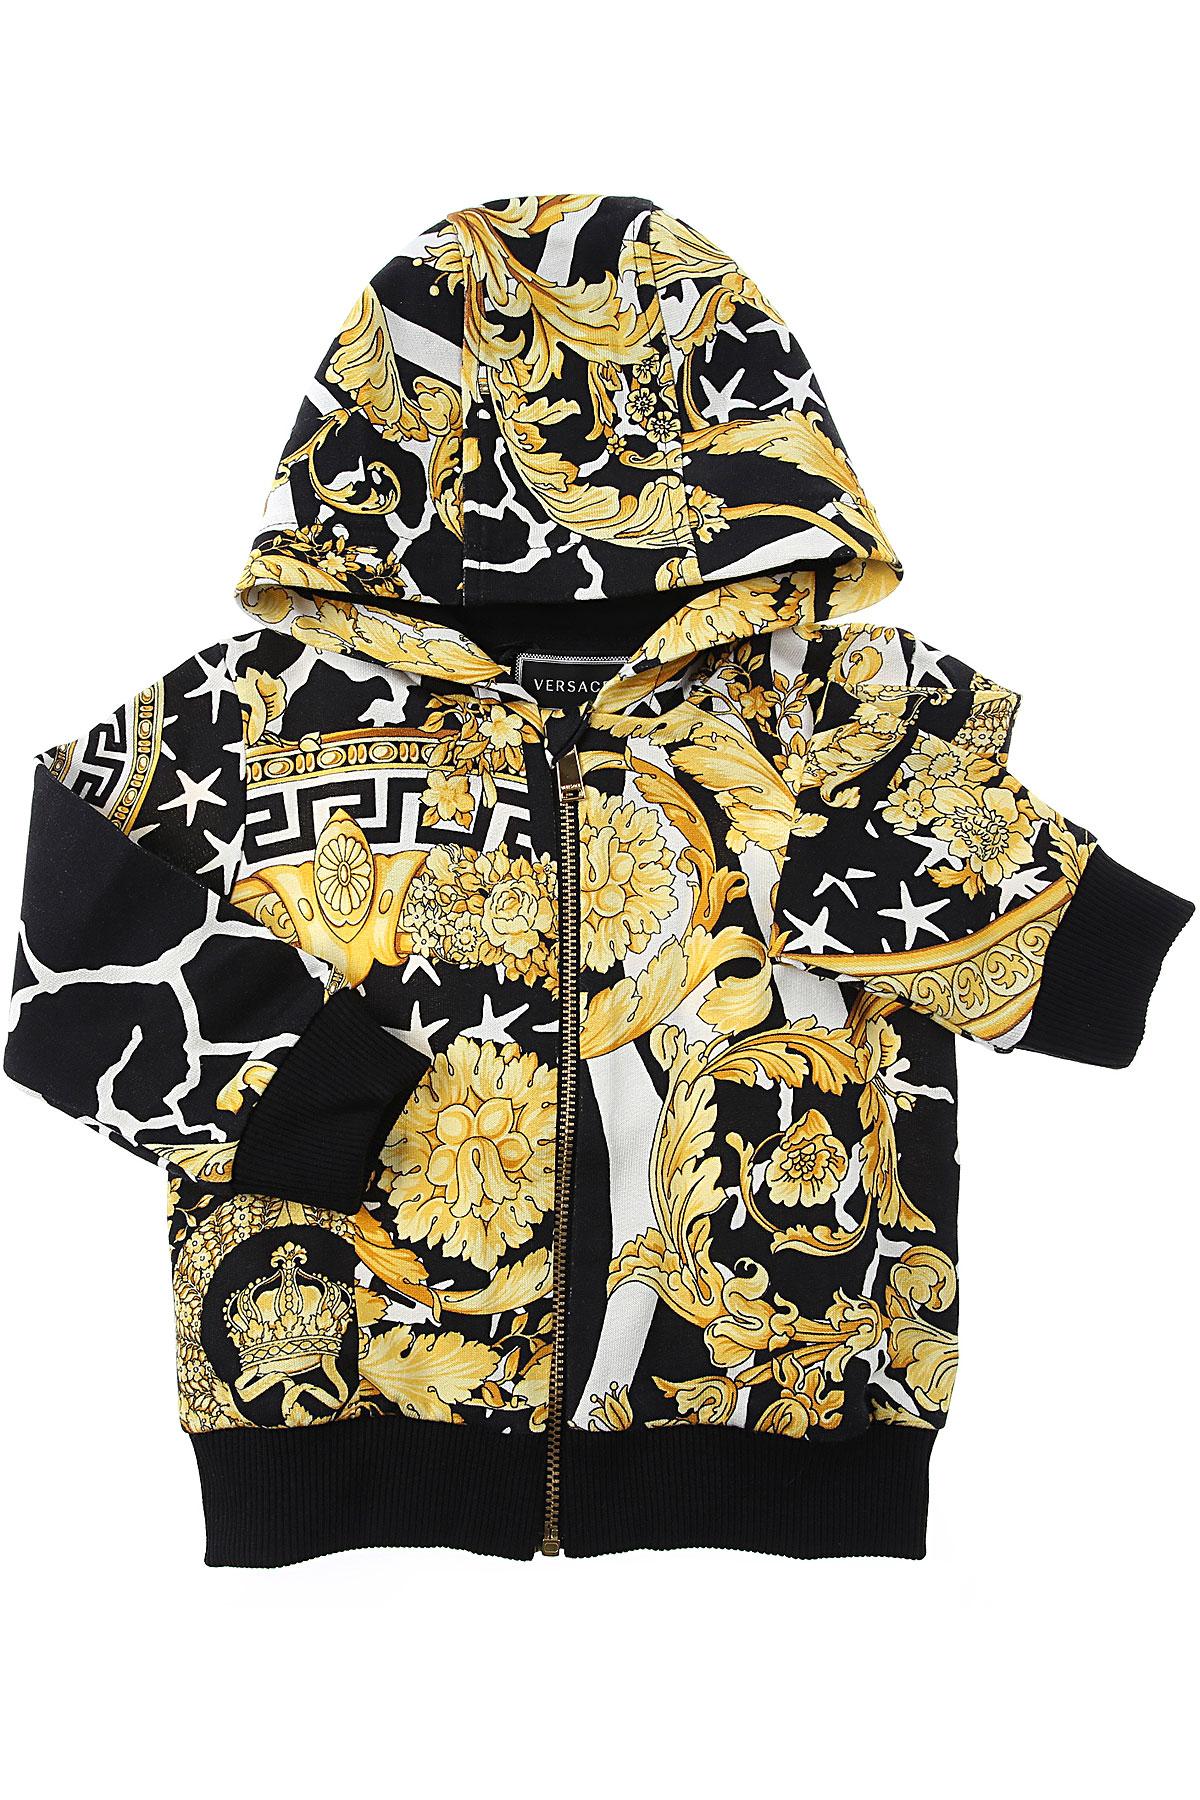 Versace Baby Sweatshirts & Hoodies for Boys On Sale, Black, Cotton, 2019, 18M 24M 2Y 3M